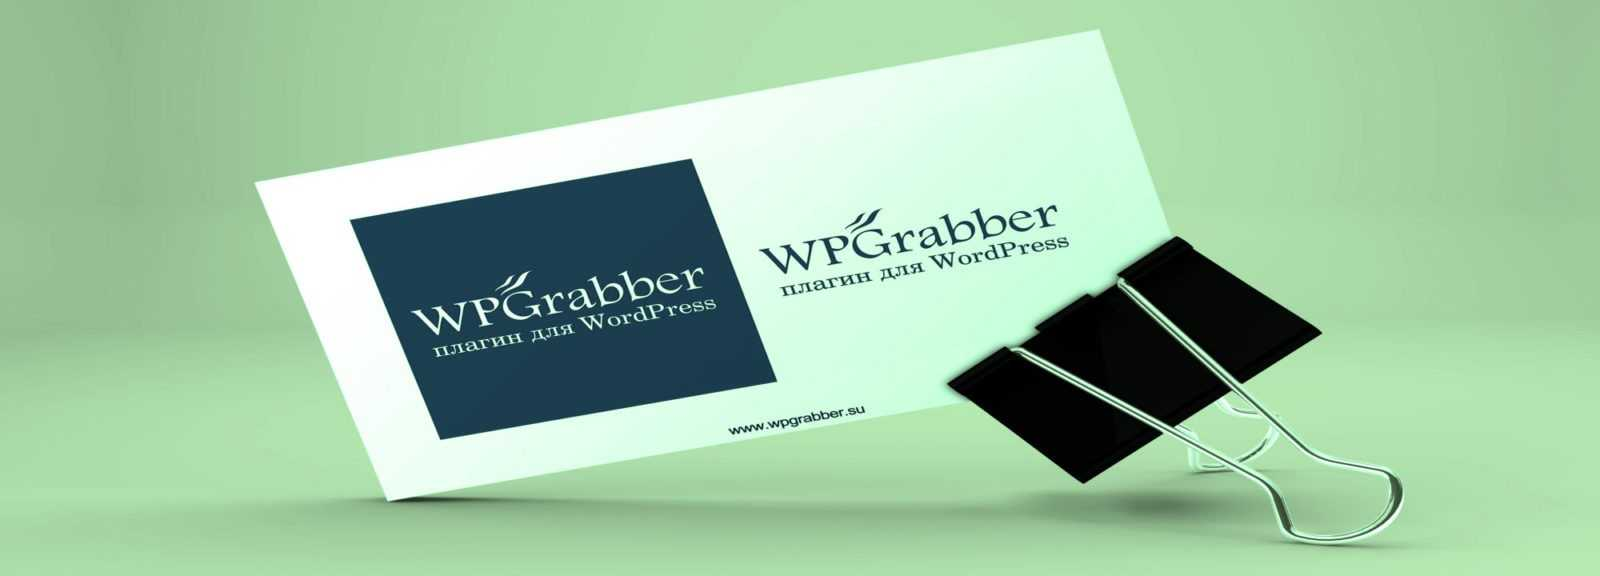 Плагин WPGrabber 3.х.х Pro + Премиум доступ